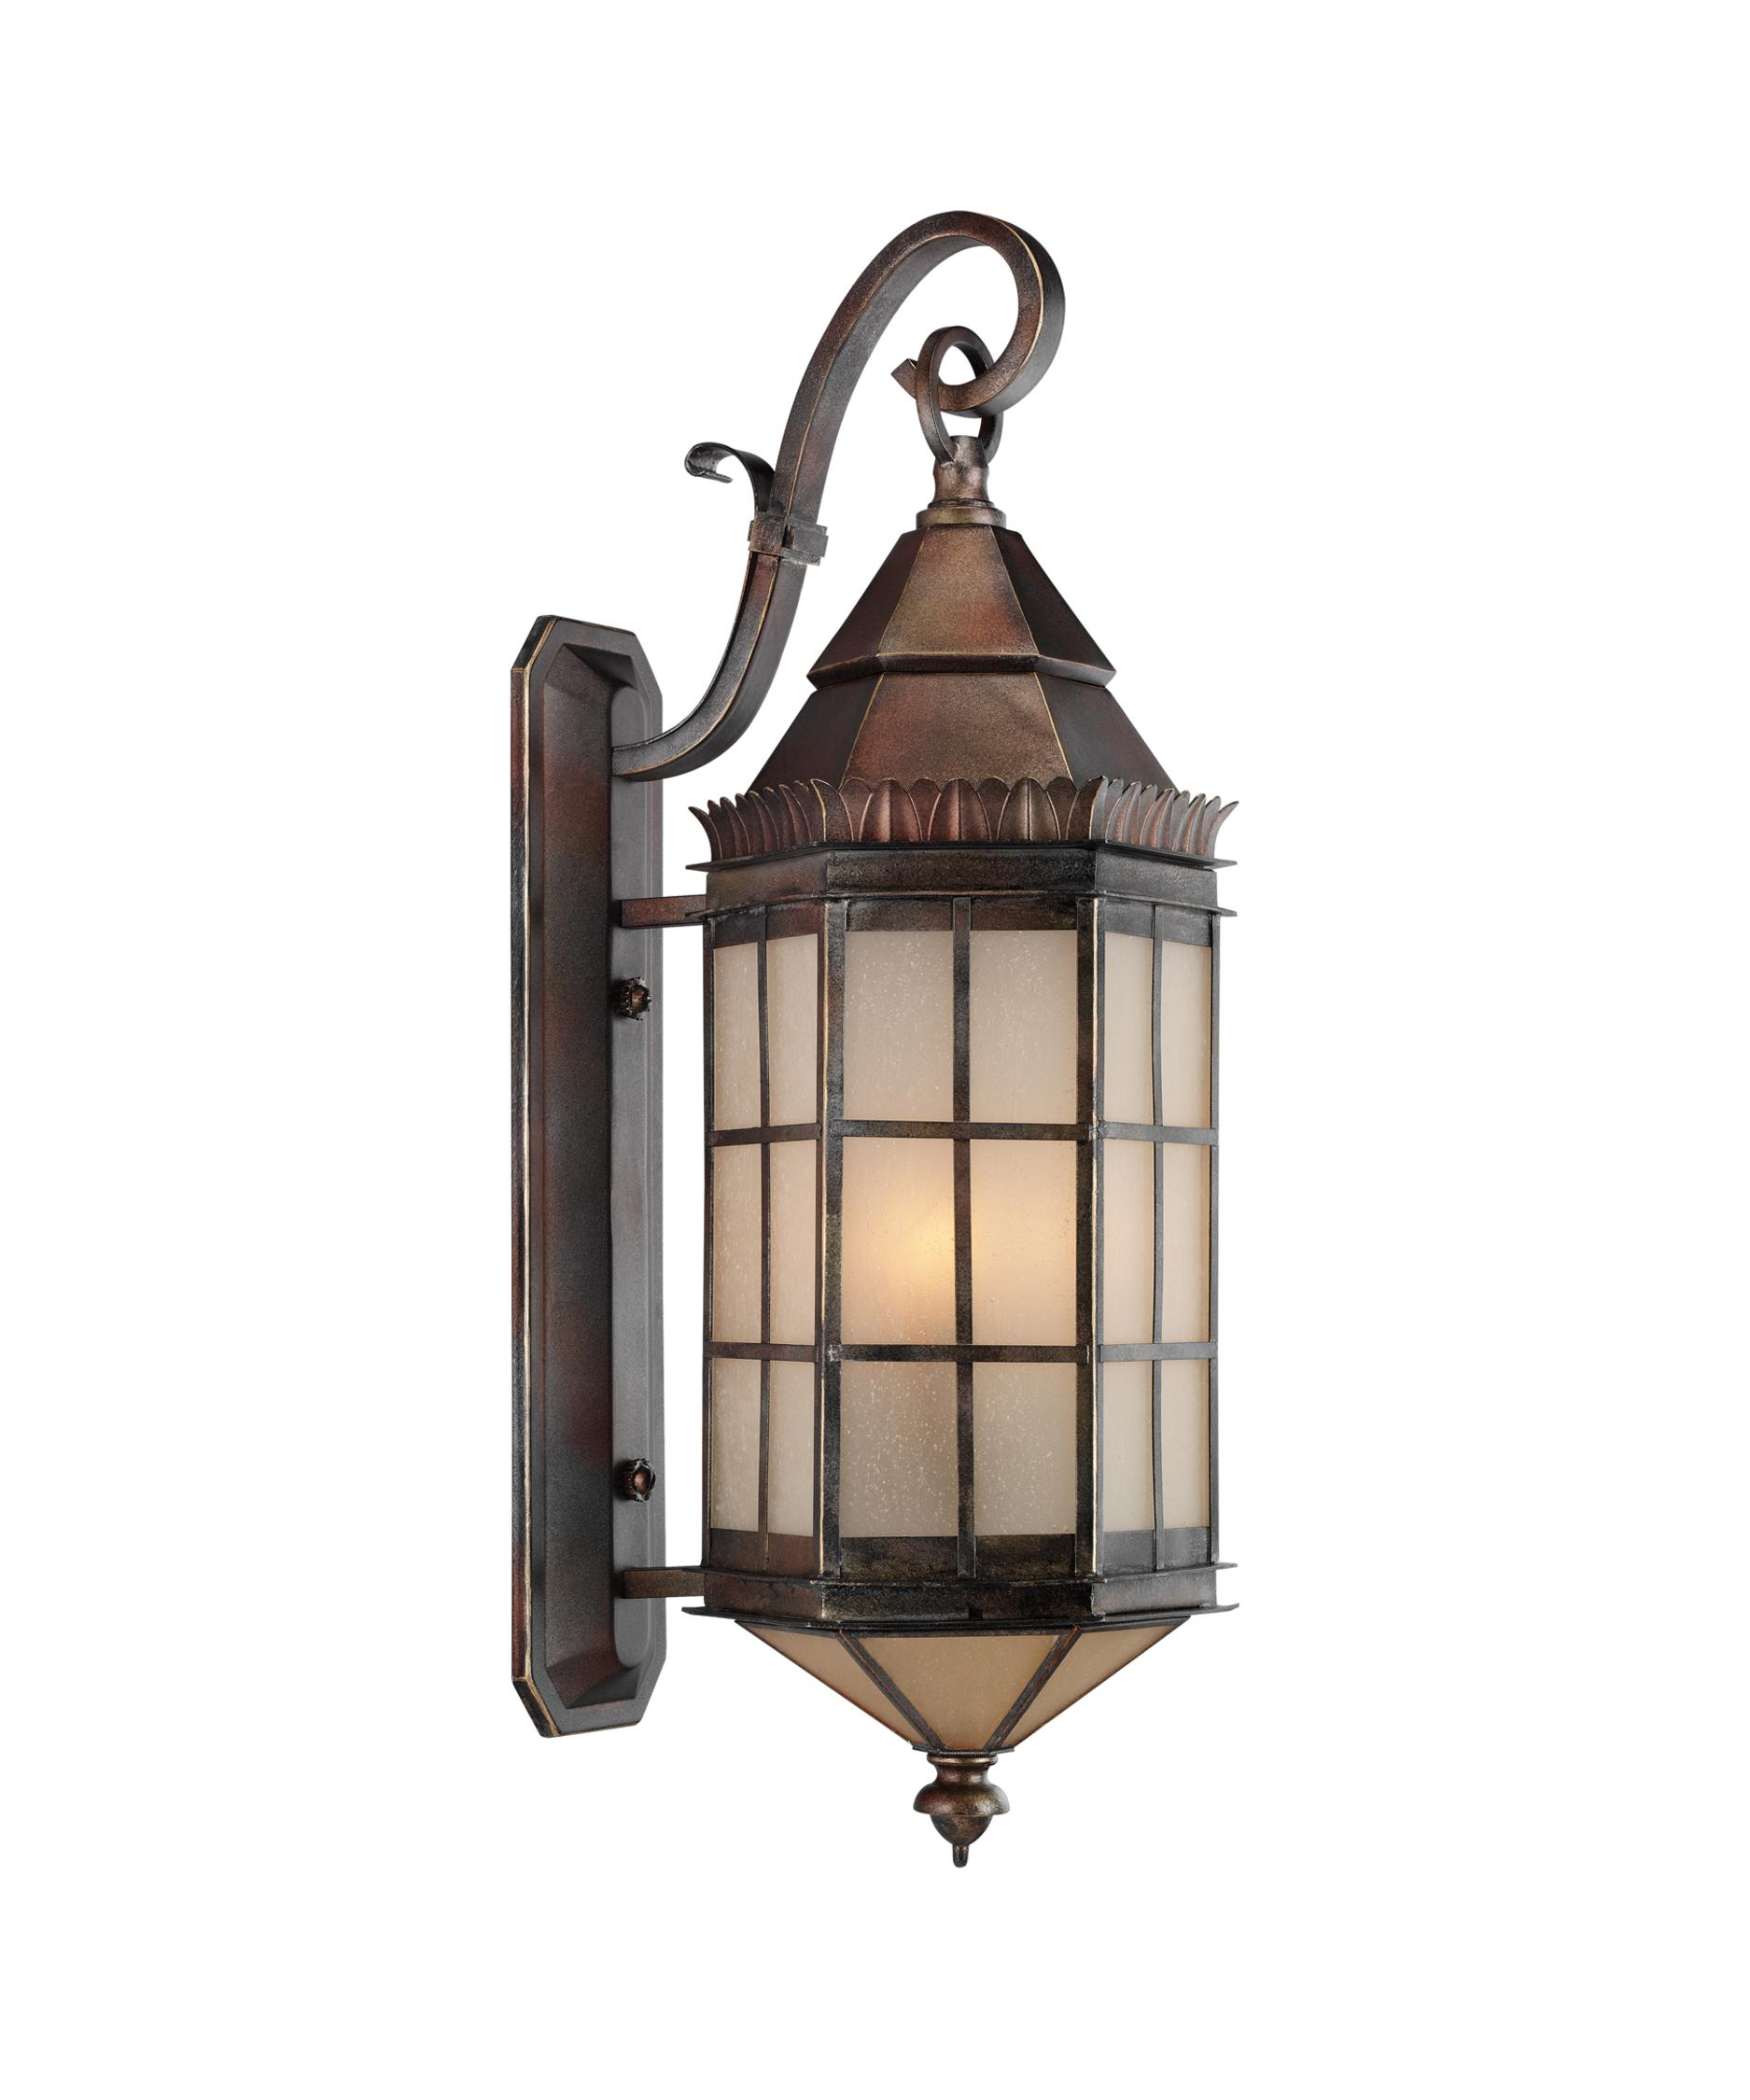 Hudson Valley Lighting Barrington: Kichler 9140 Barrington 3 Light Outdoor Wall Light